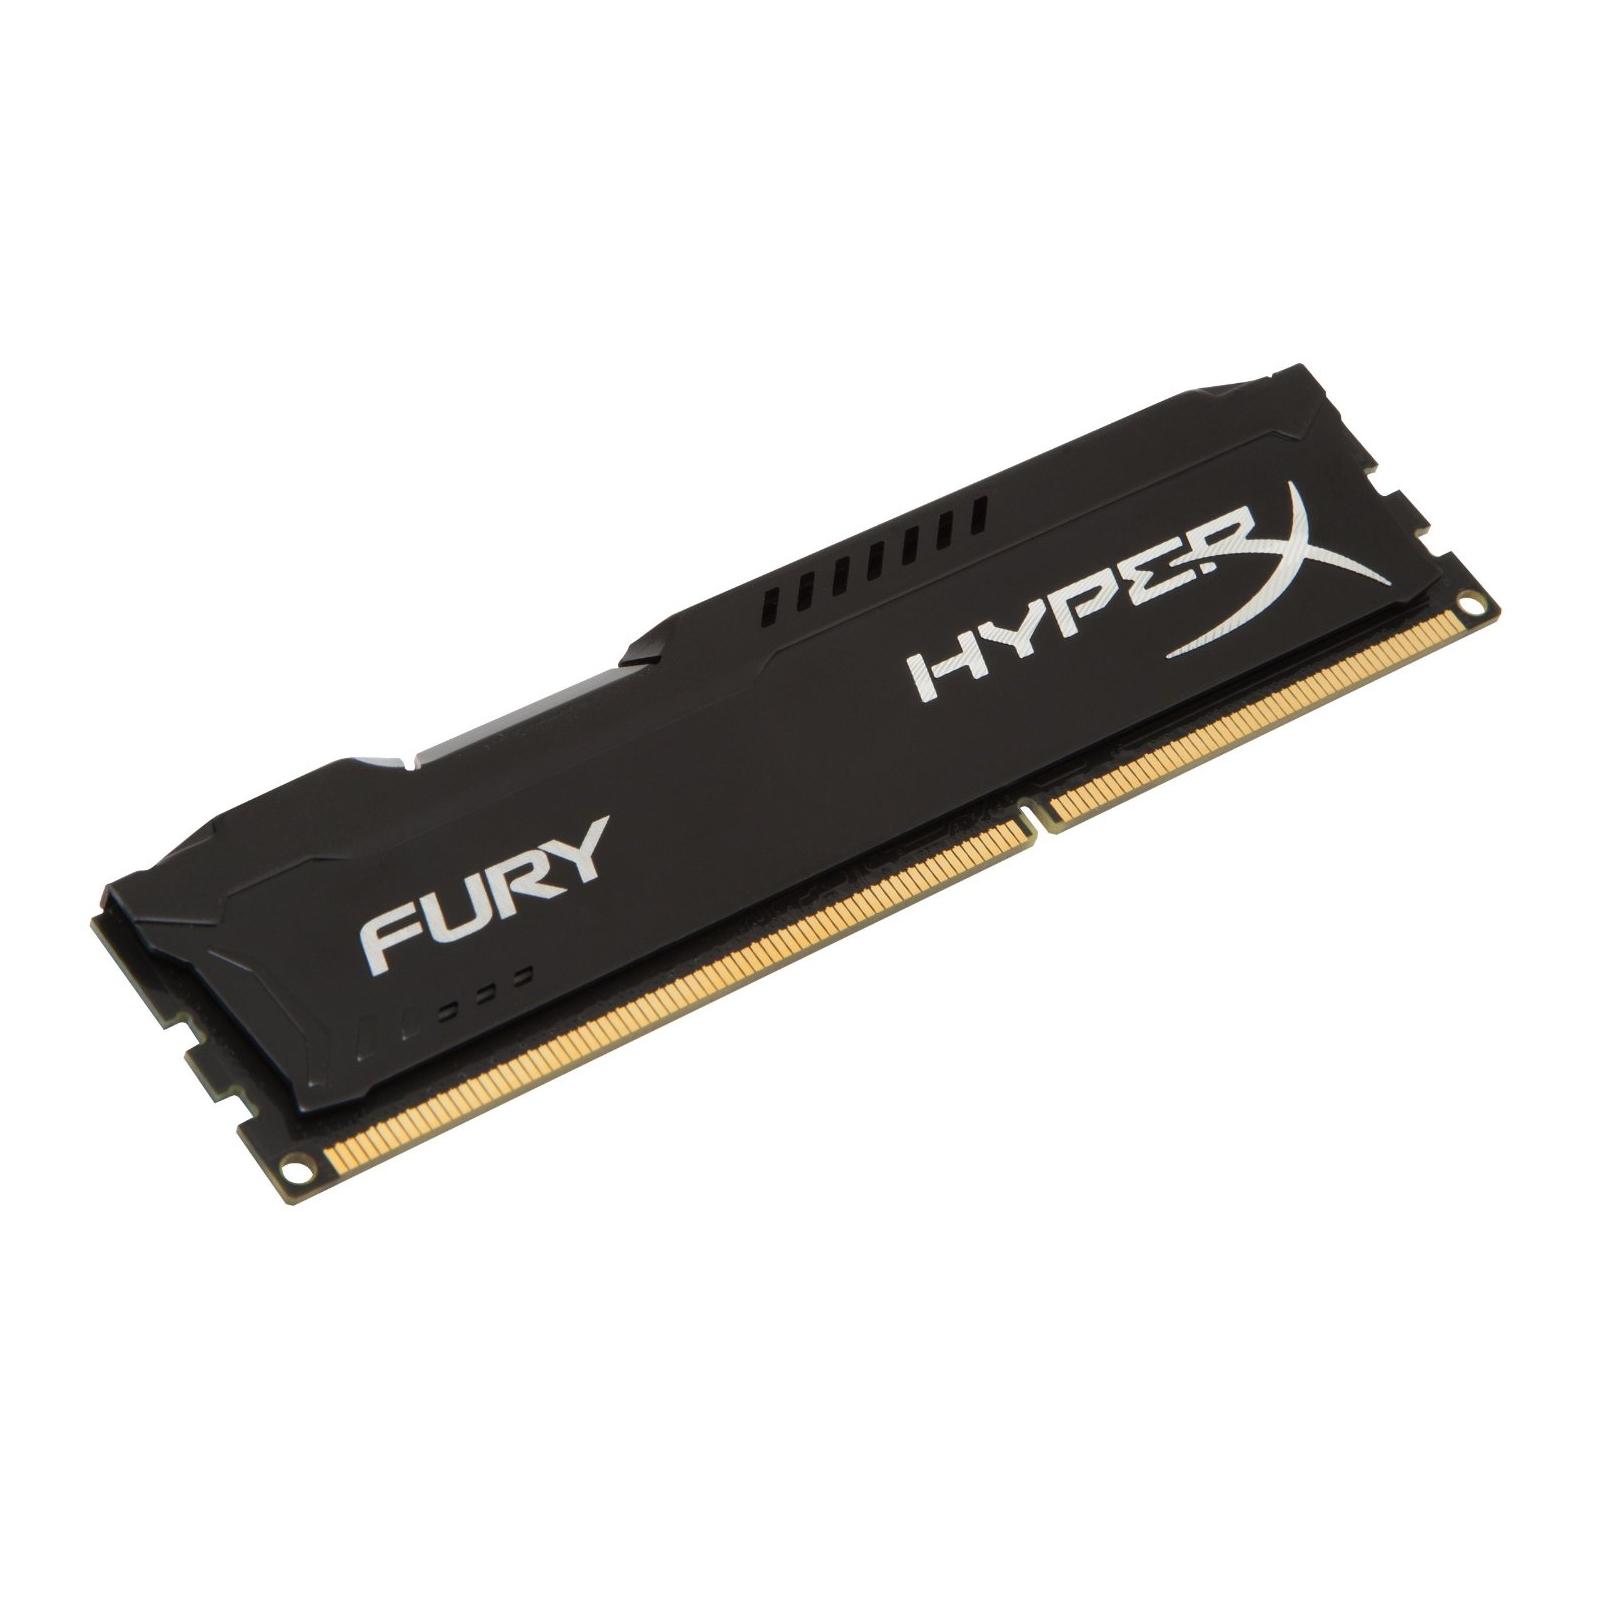 Модуль памяти для компьютера DDR3 8Gb 1600 MHz HyperX Fury Black Kingston (HX316C10FB/8) изображение 2